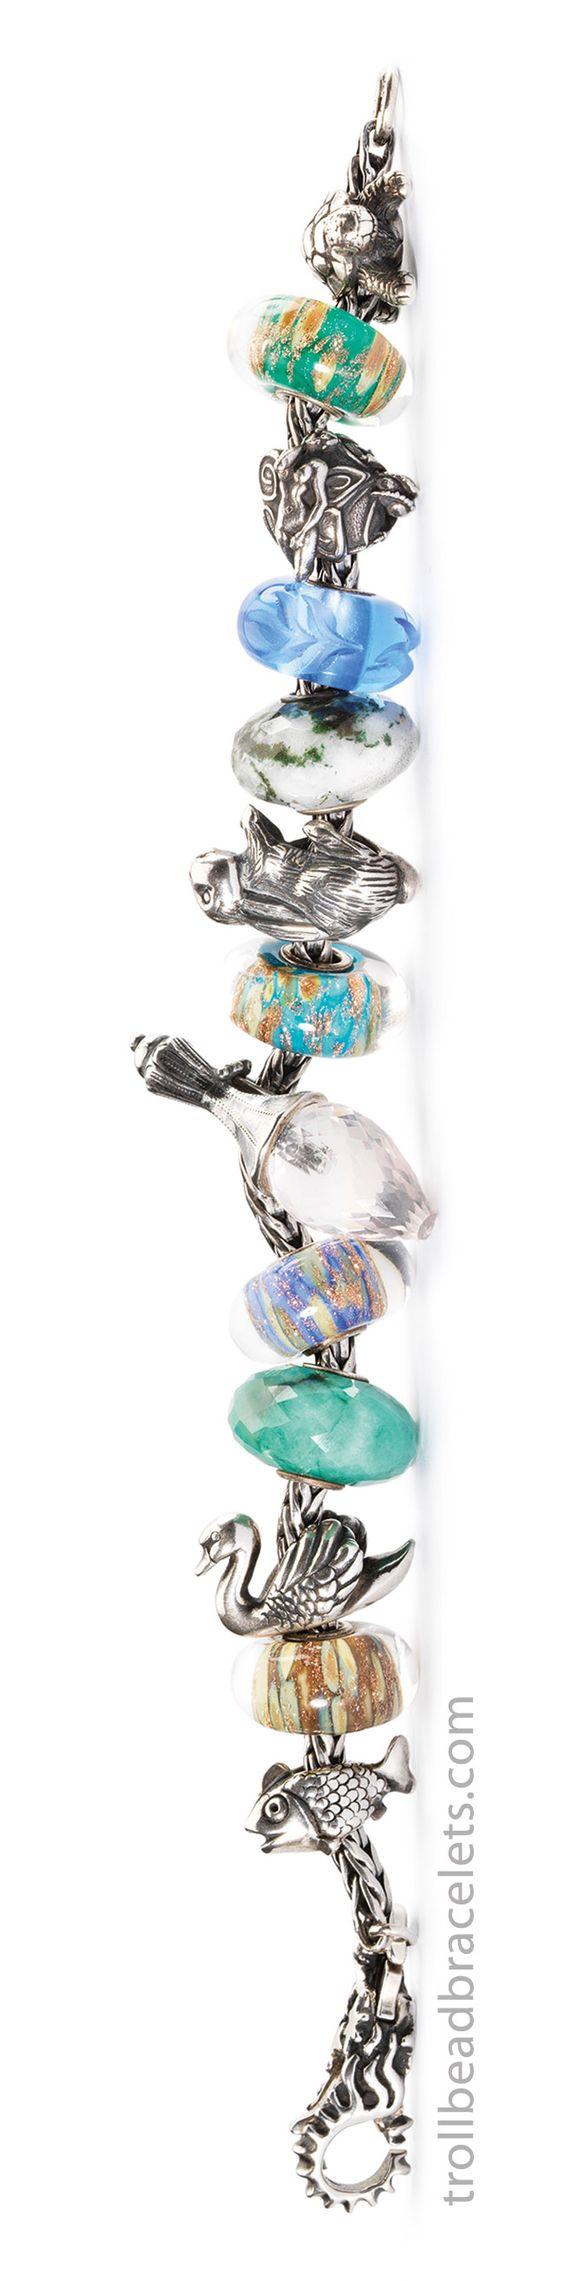 Trollbeads 2014 spring collection hanging garden bracelet